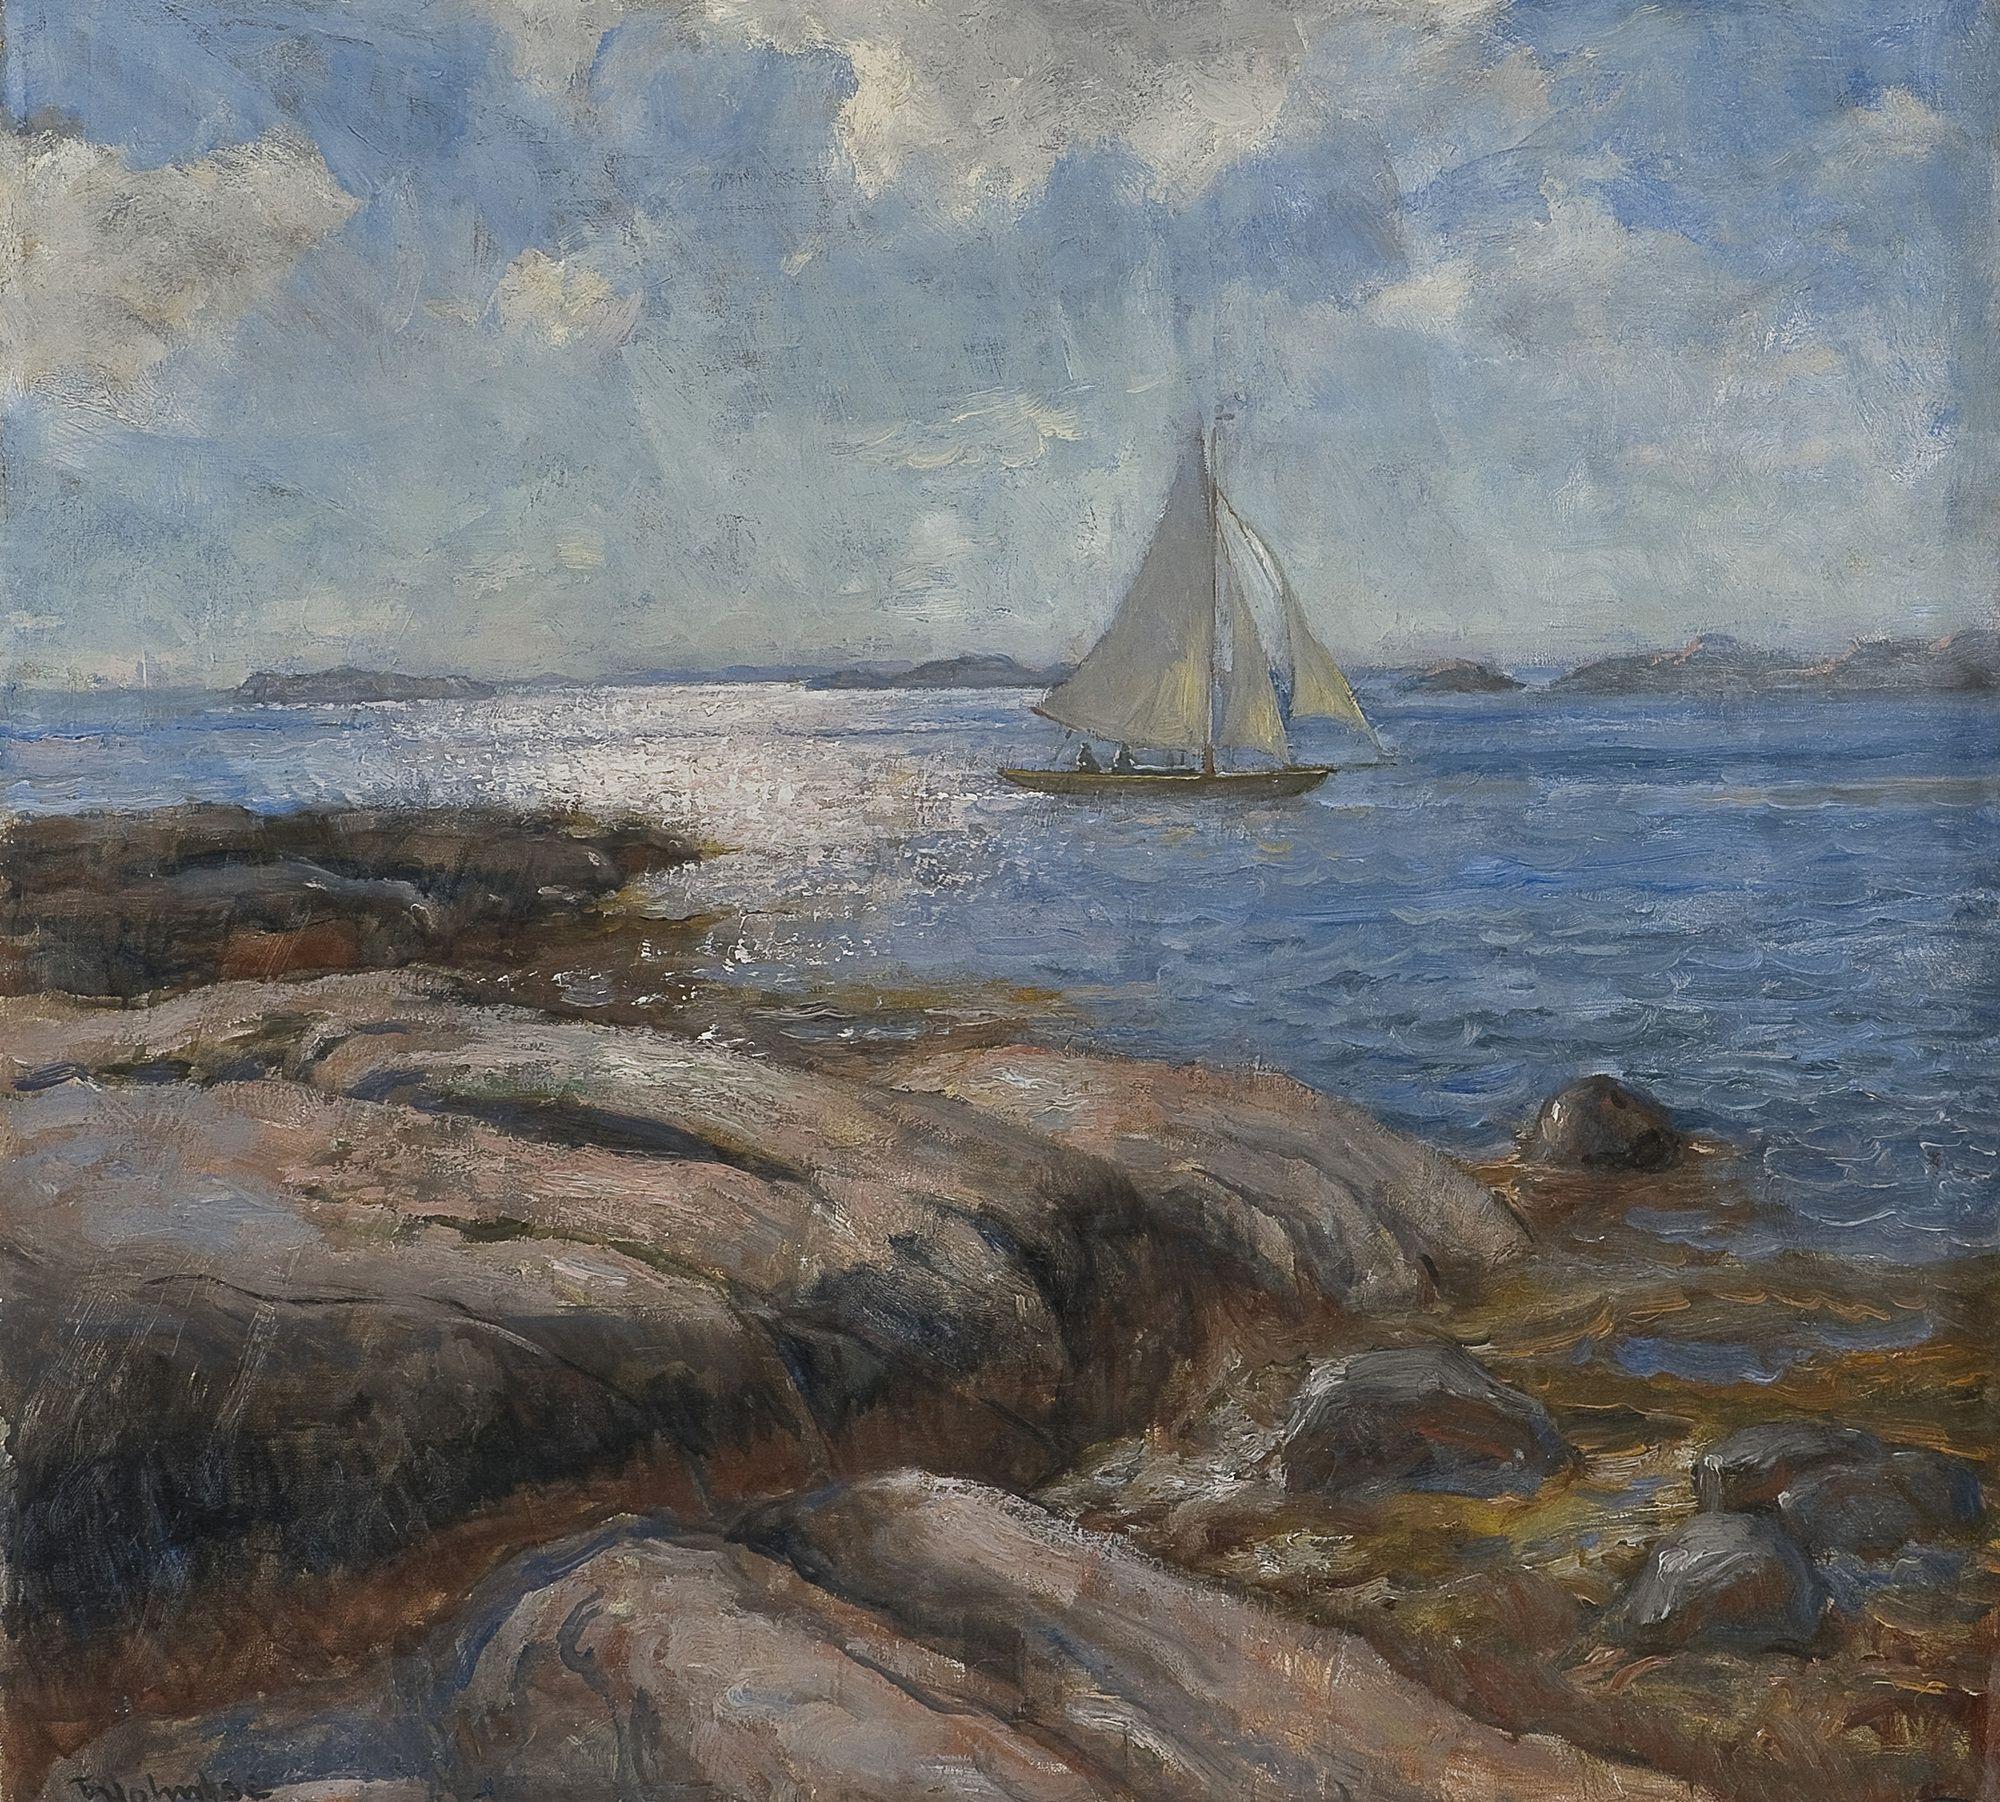 Thorolf Holmboe 1866-1935: Seilbåt i lett bris